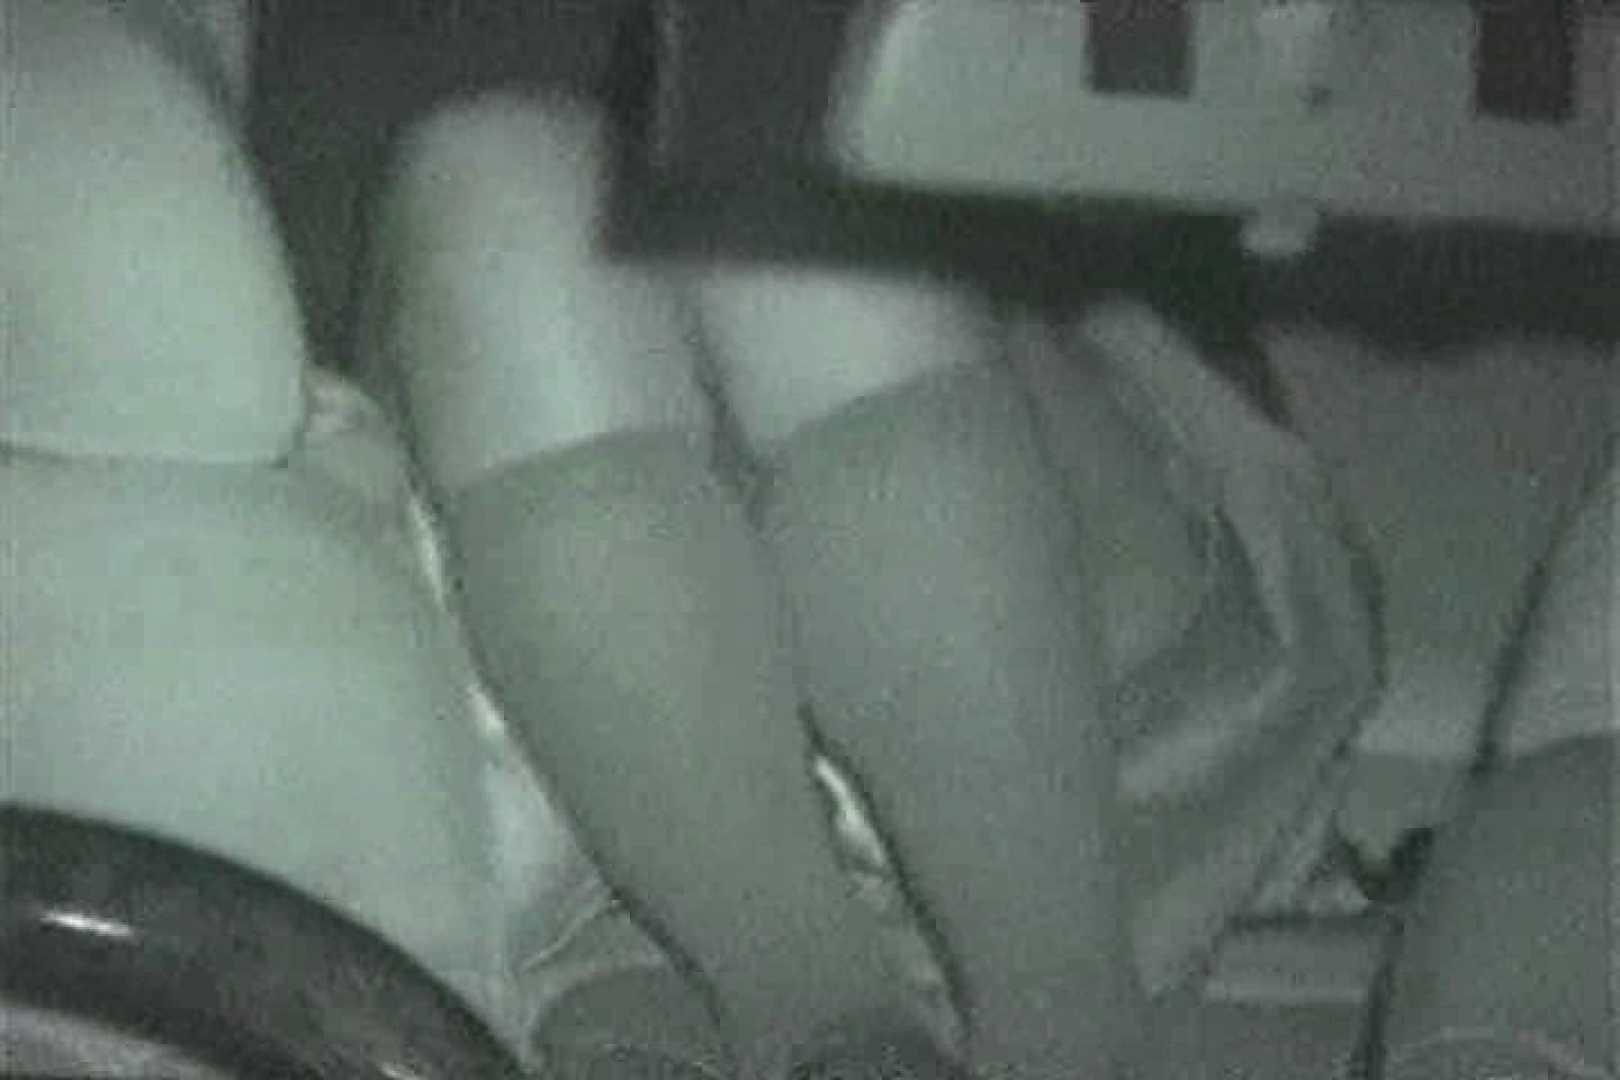 MASAさんの待ち伏せ撮り! 赤外線カーセックスVol.18 OLエロ画像 盗み撮りAV無料動画キャプチャ 64PICs 37